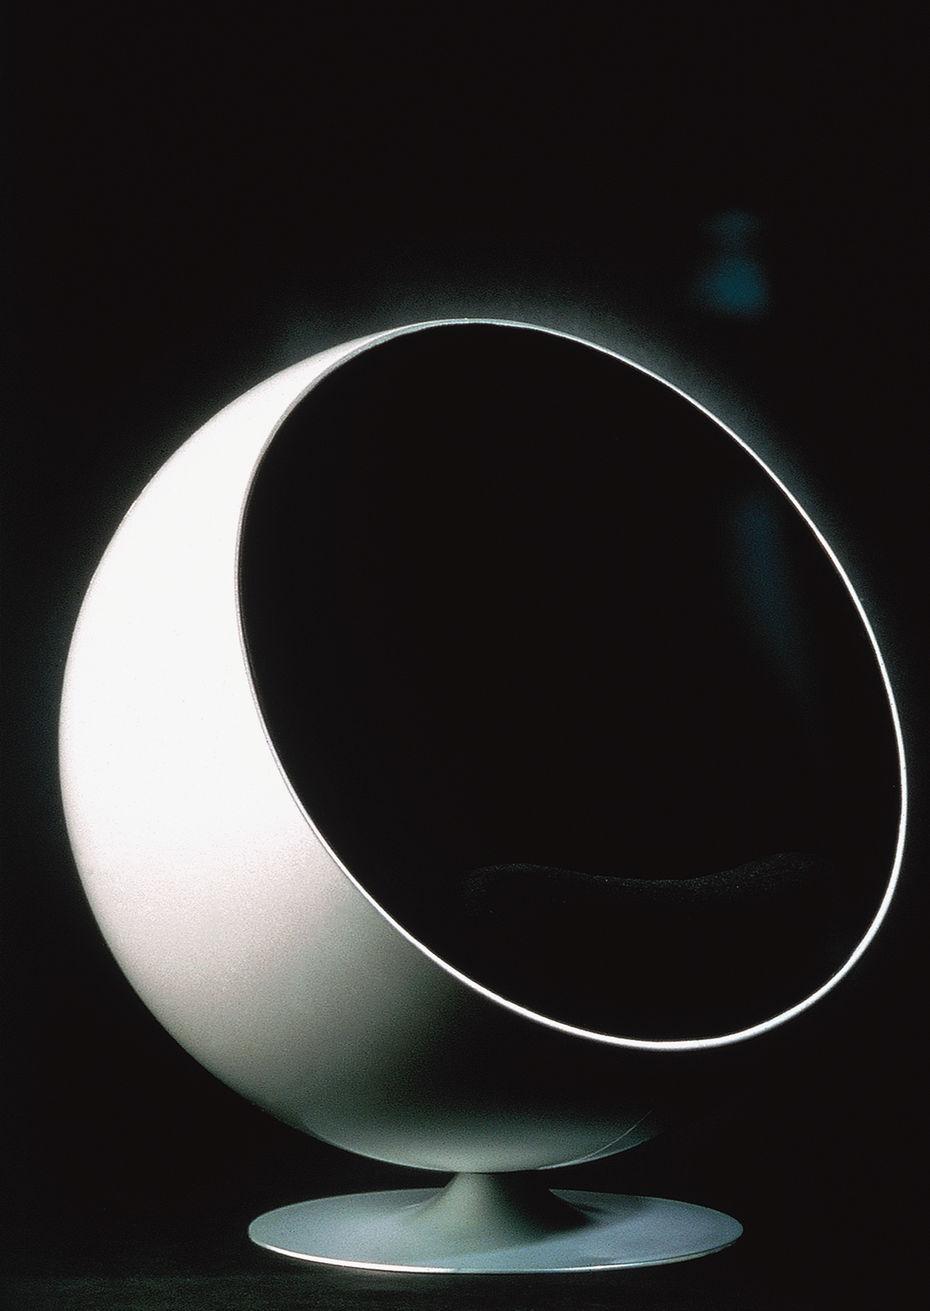 Кресло Ball. Стекловолокно, мягкая обивка.1963